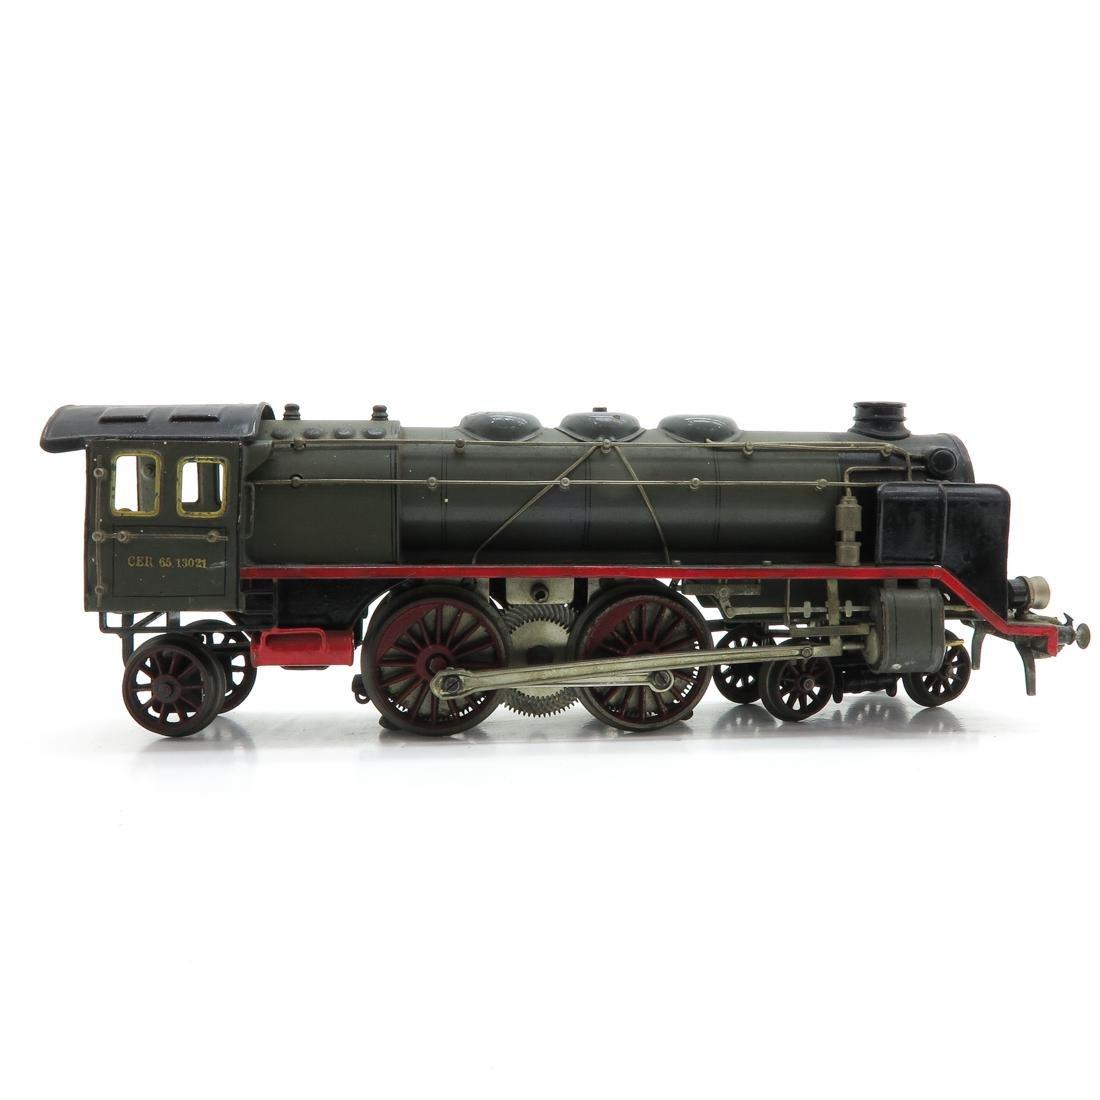 Vintage Marklin Locomotive - 3